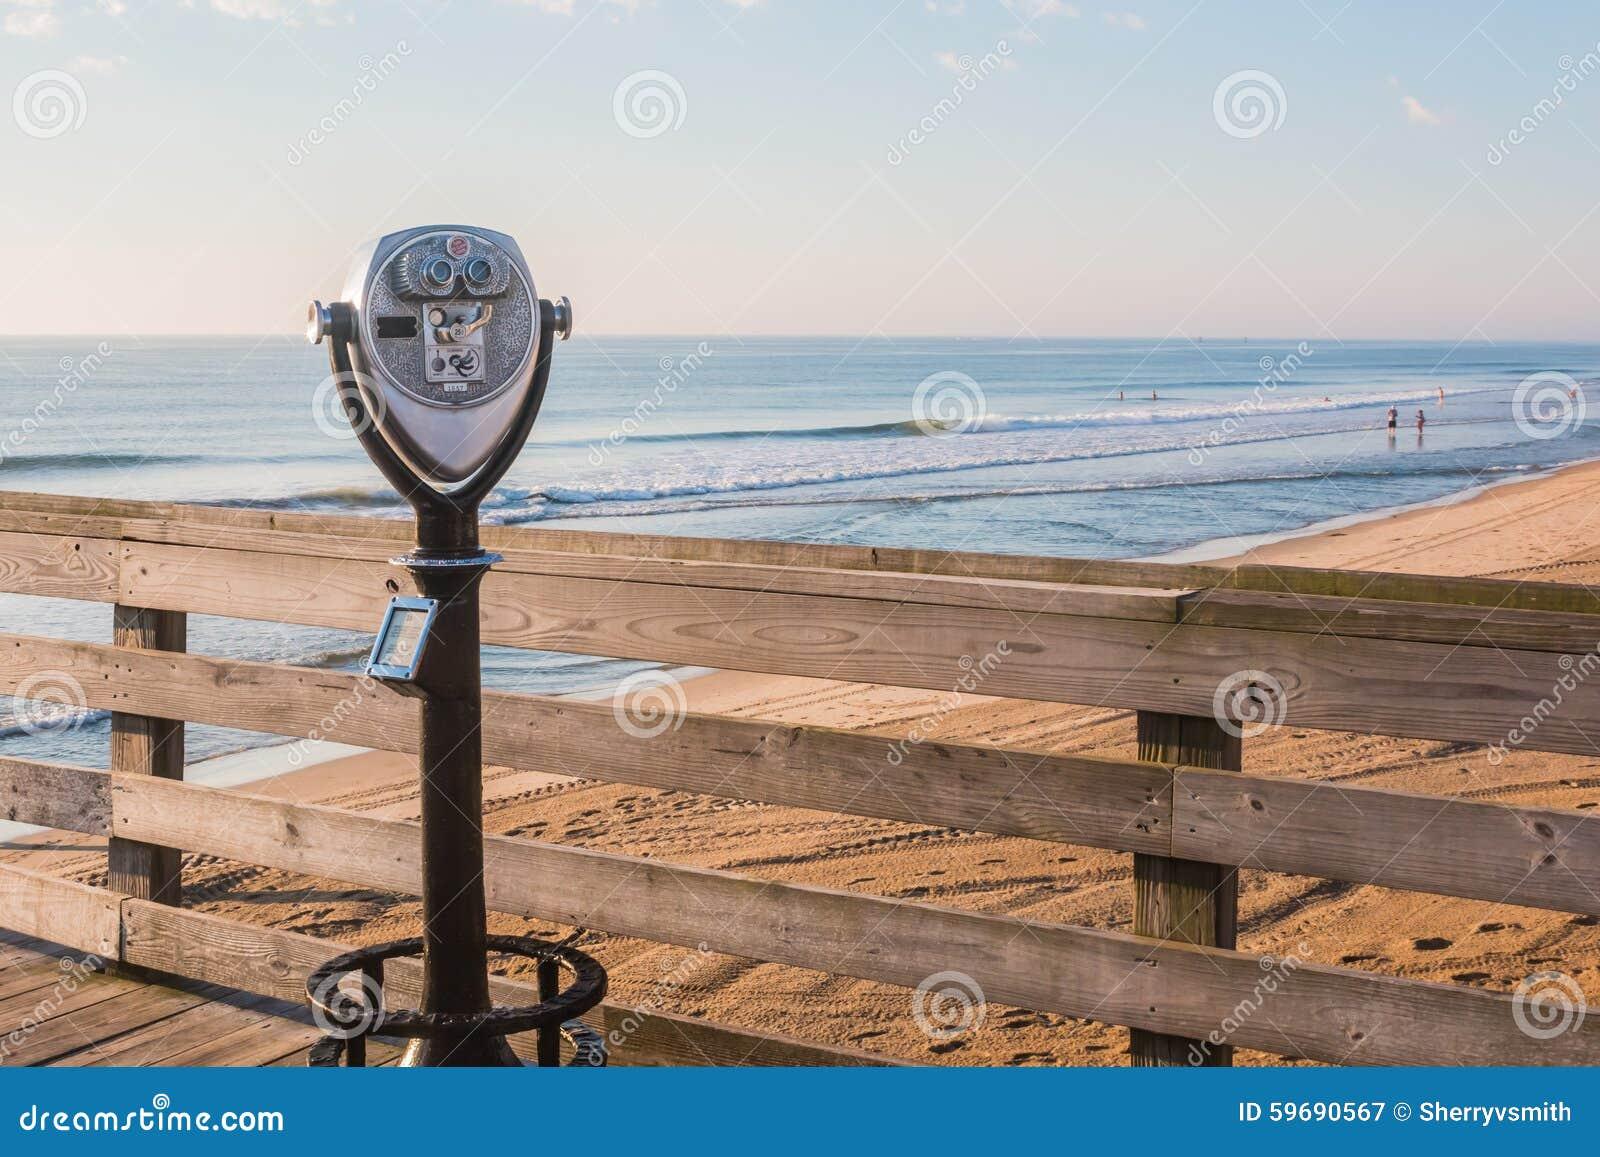 Sightseeing Binoculars On Pier Stock Photo - Image of